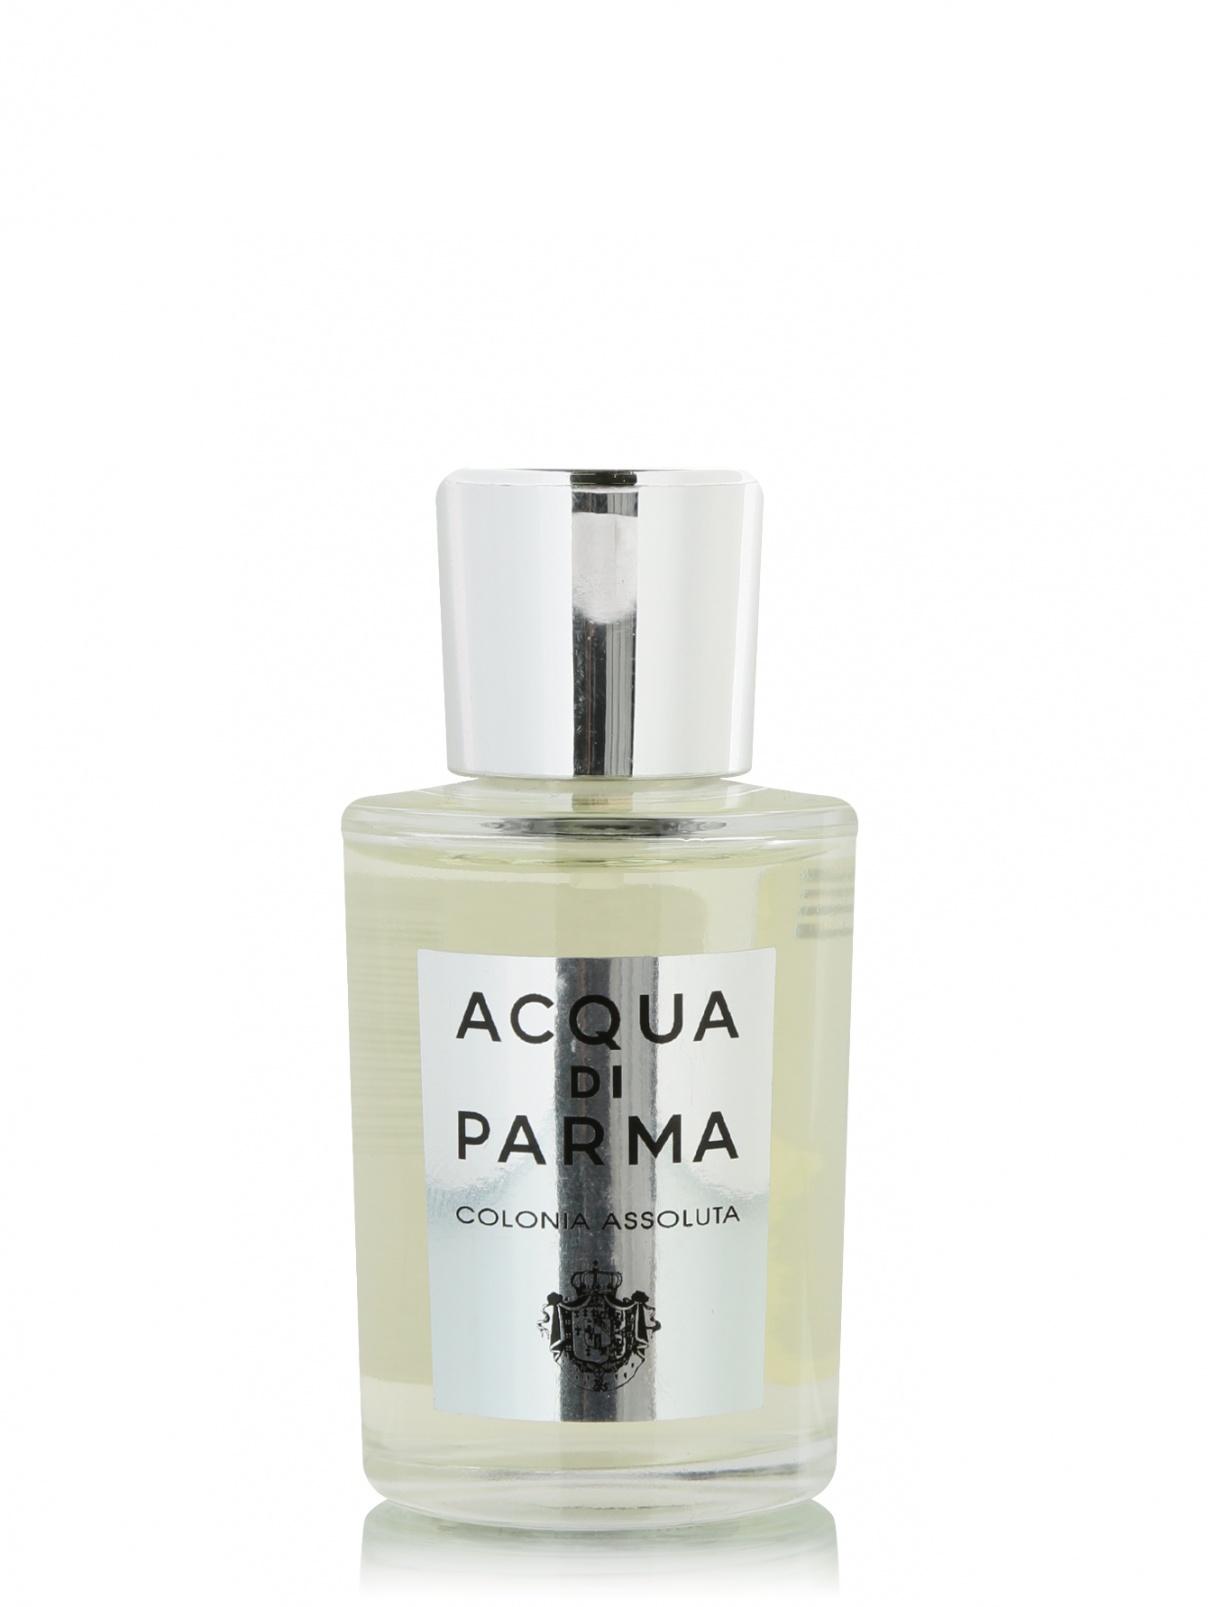 Одеколон 20мл Colonia Assoluta Acqua di Parma  –  Общий вид